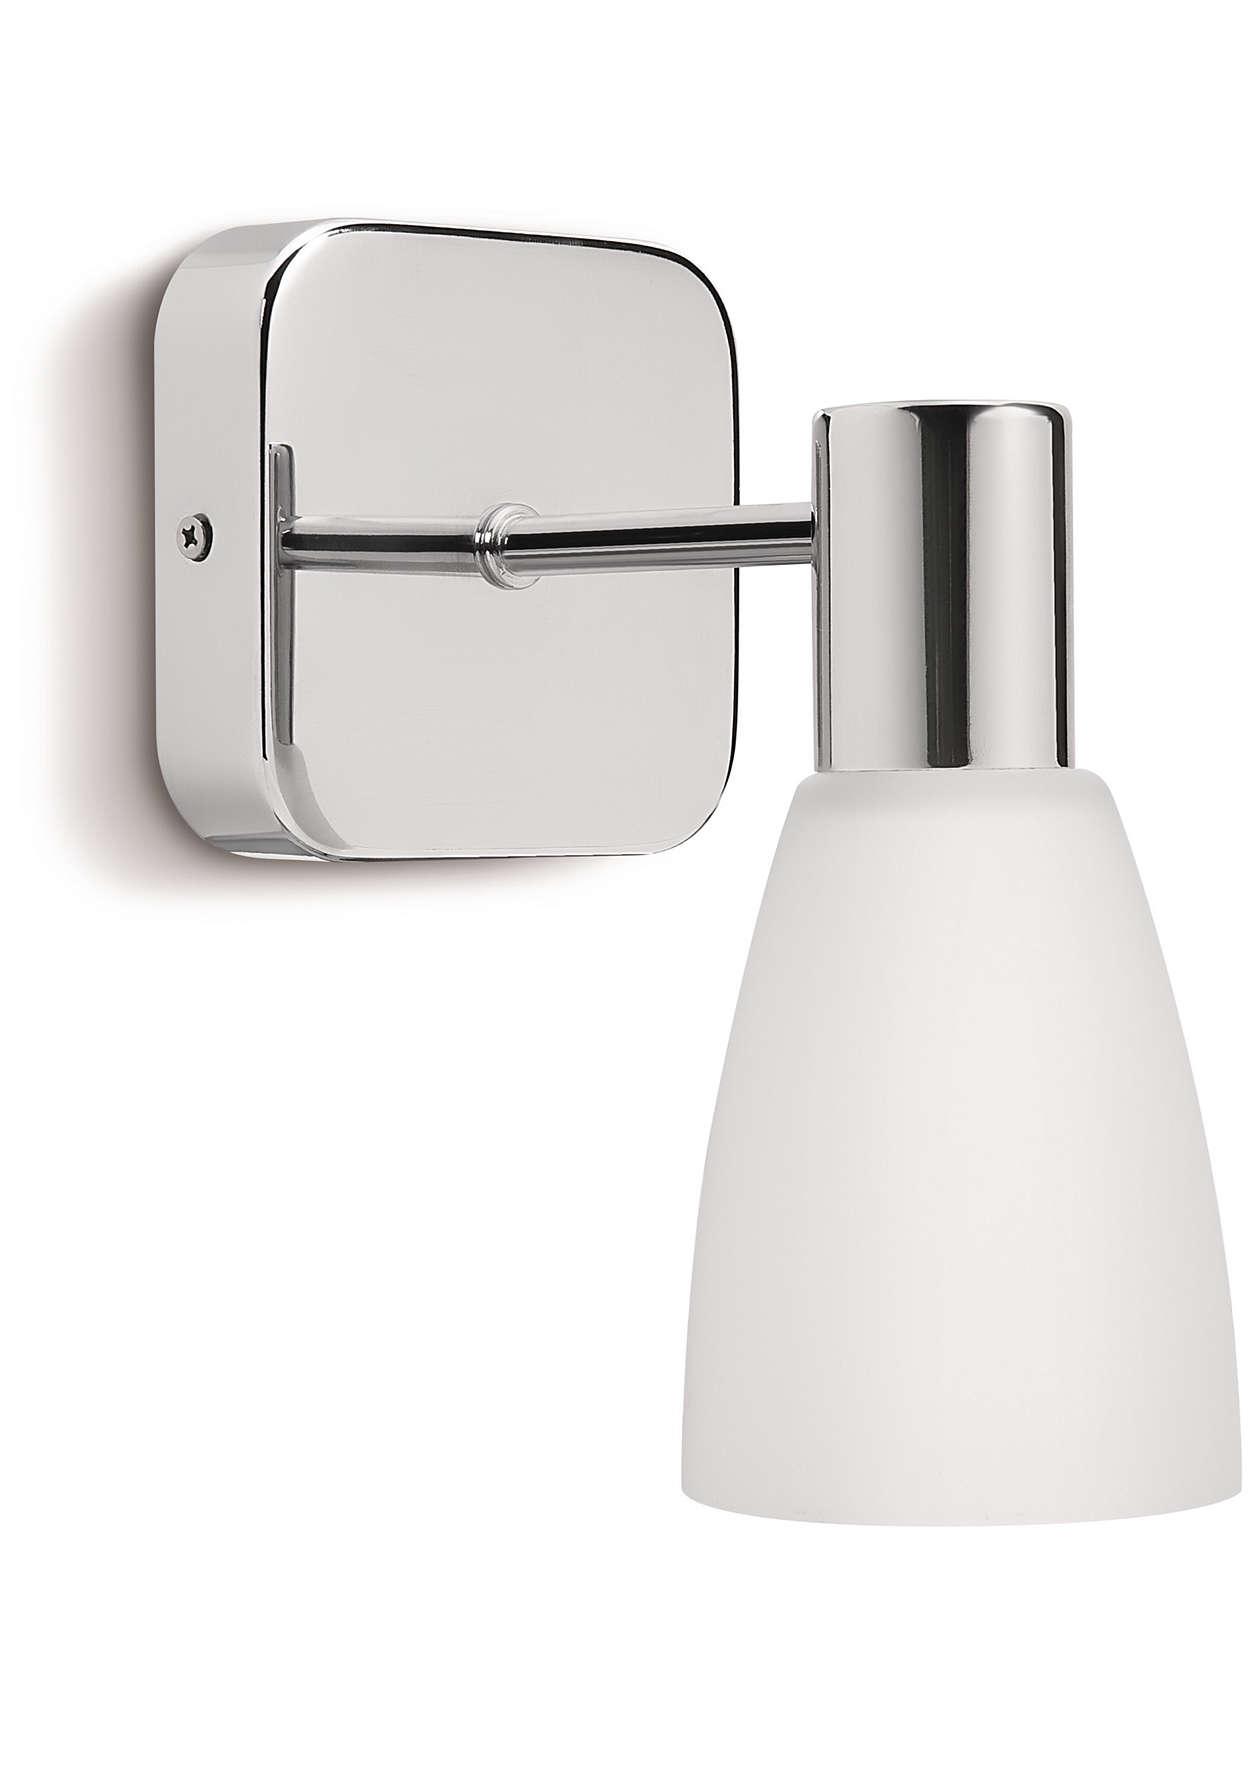 Превратите ванную комнату в спа-салон